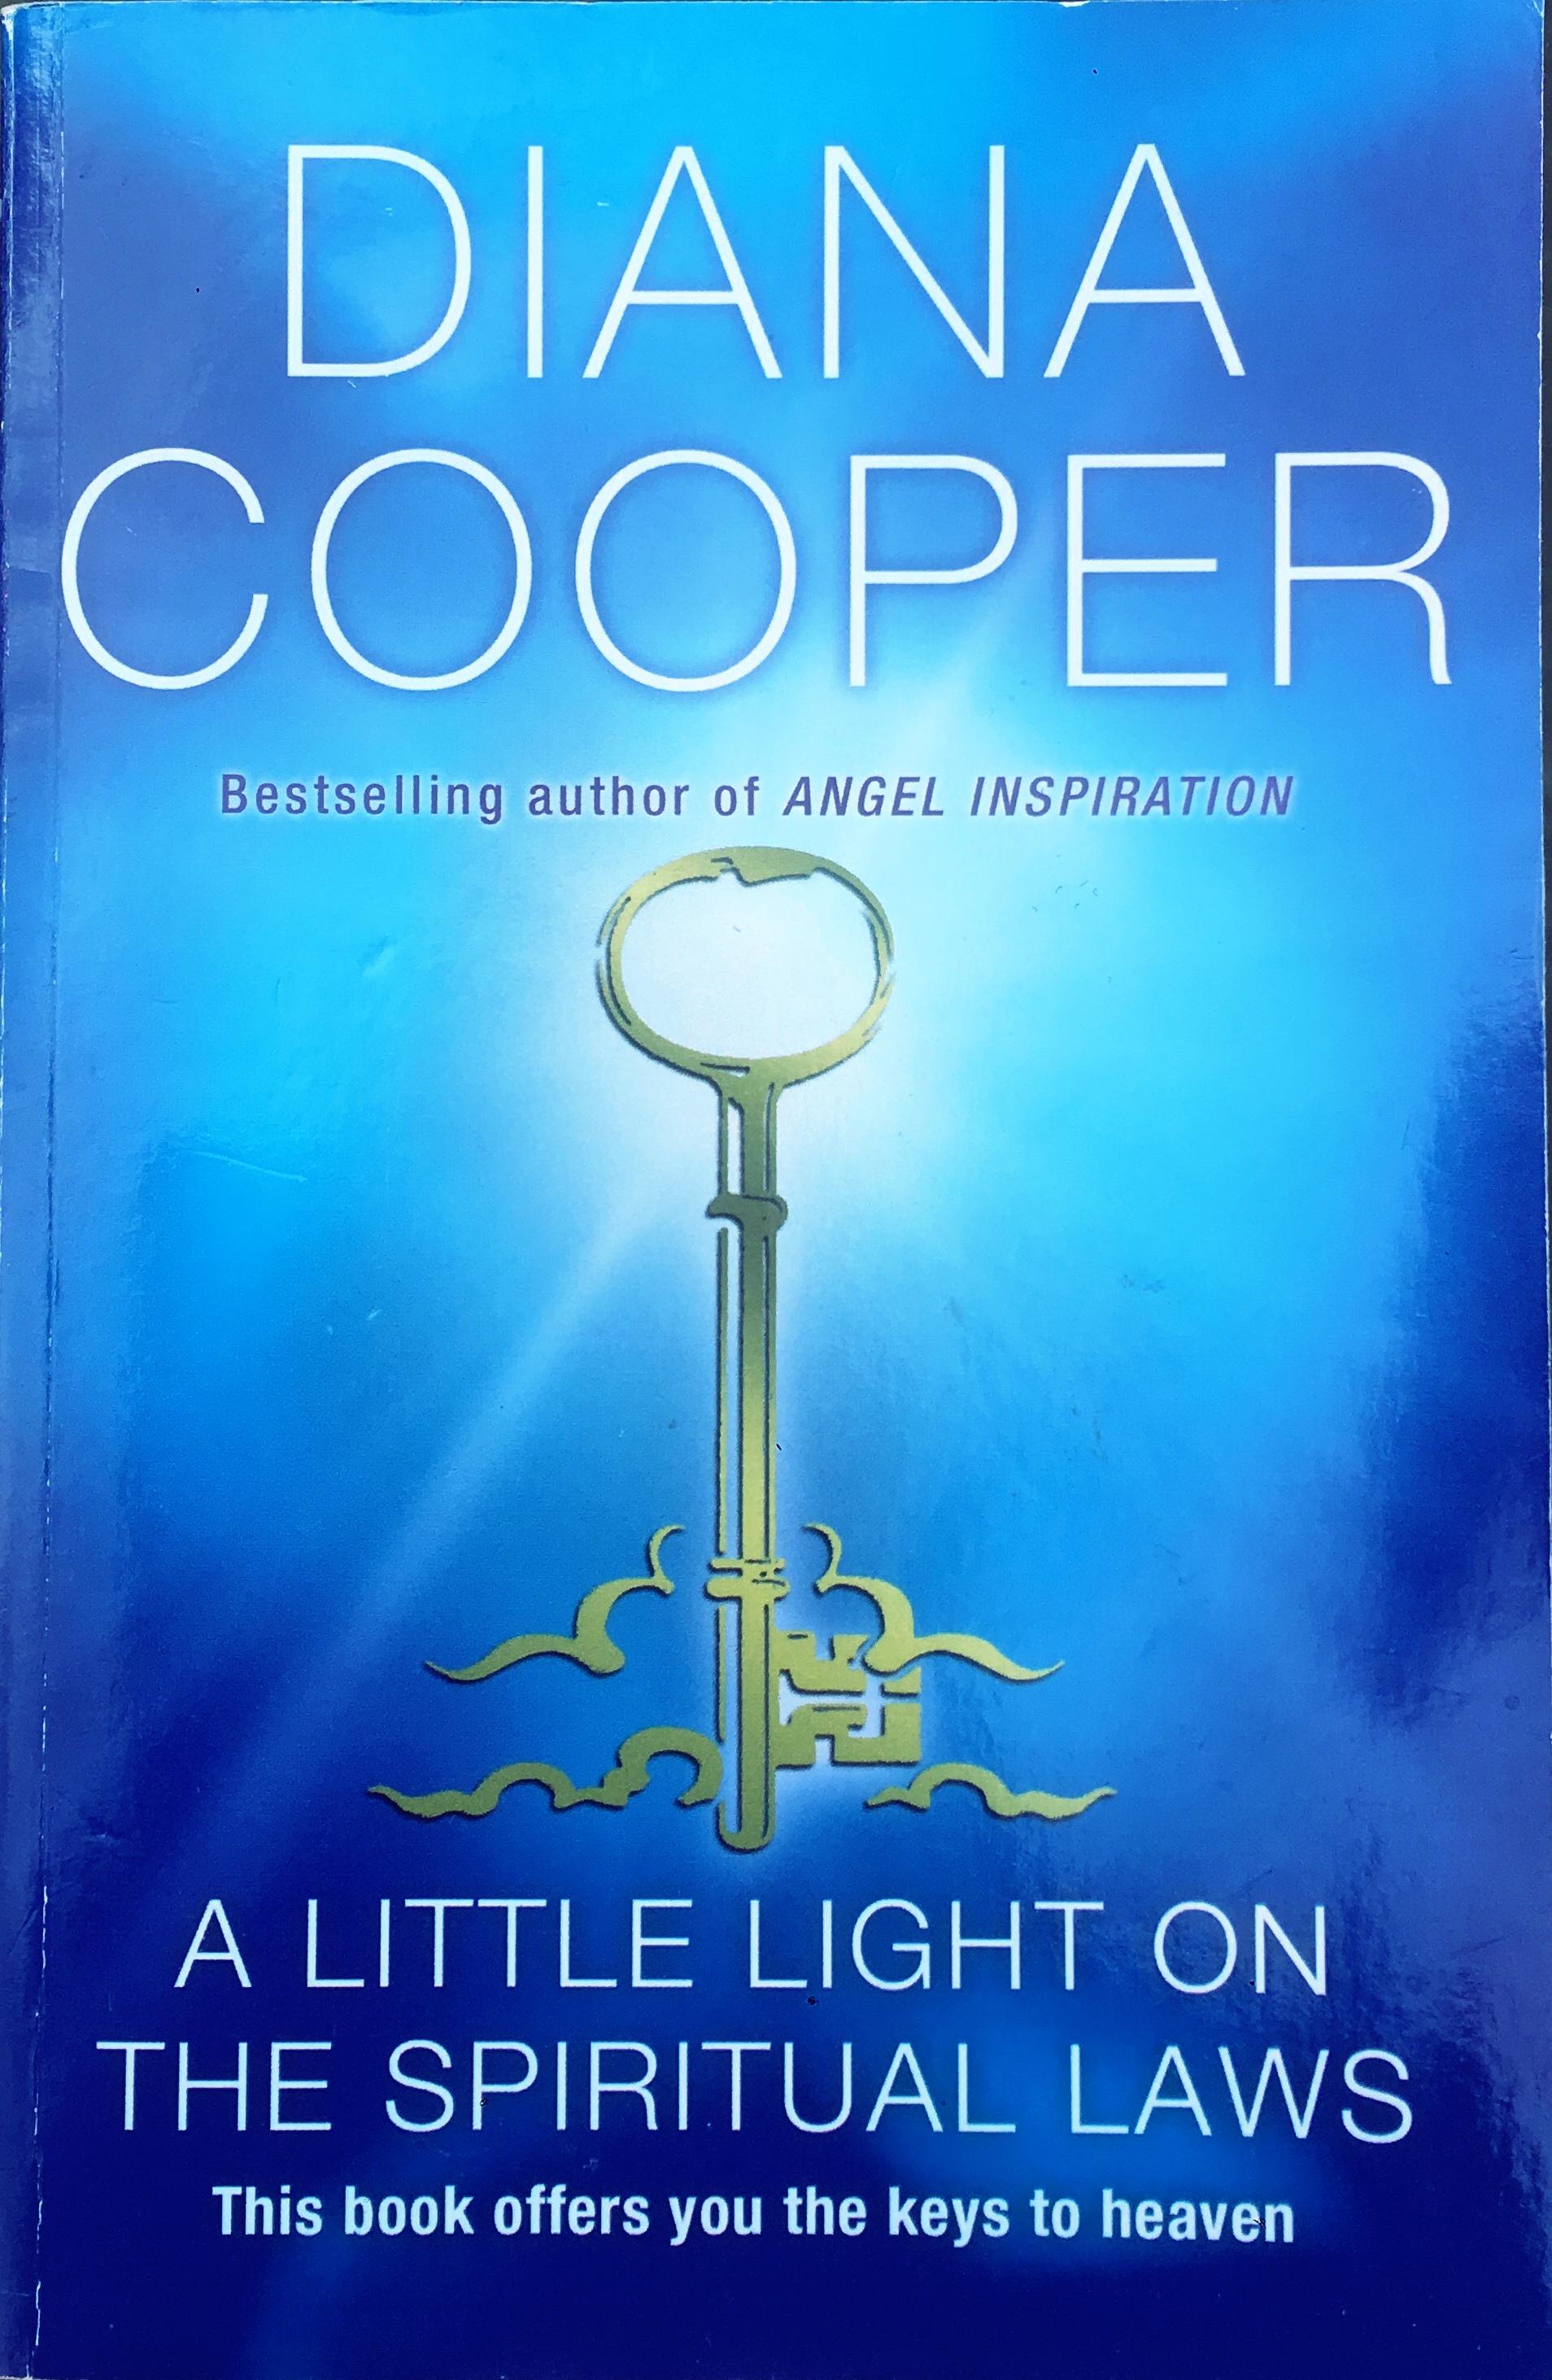 A little light on the spiritual laws BOOK.jpg